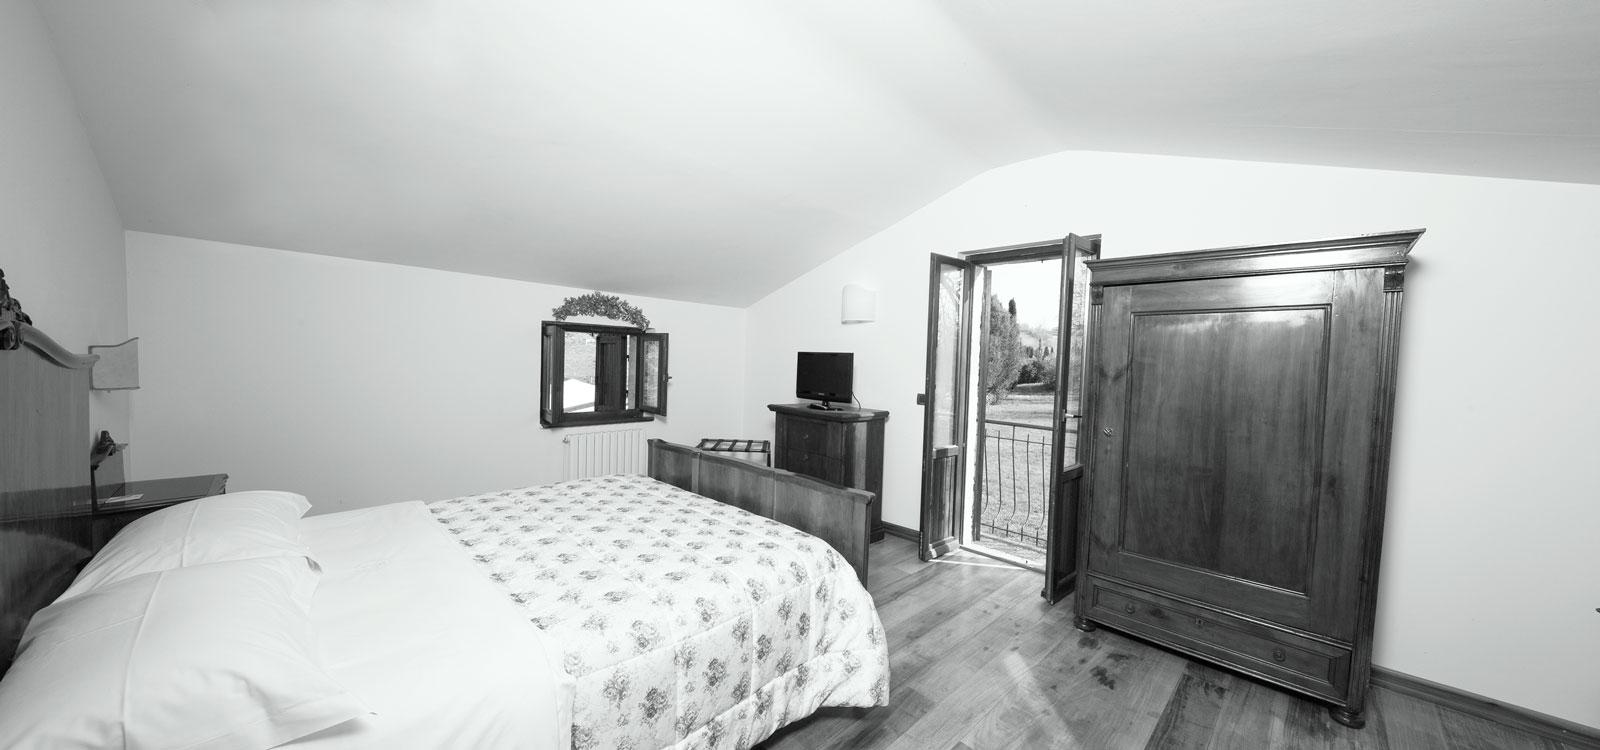 Dépendance del Resort Le Case a Macerata